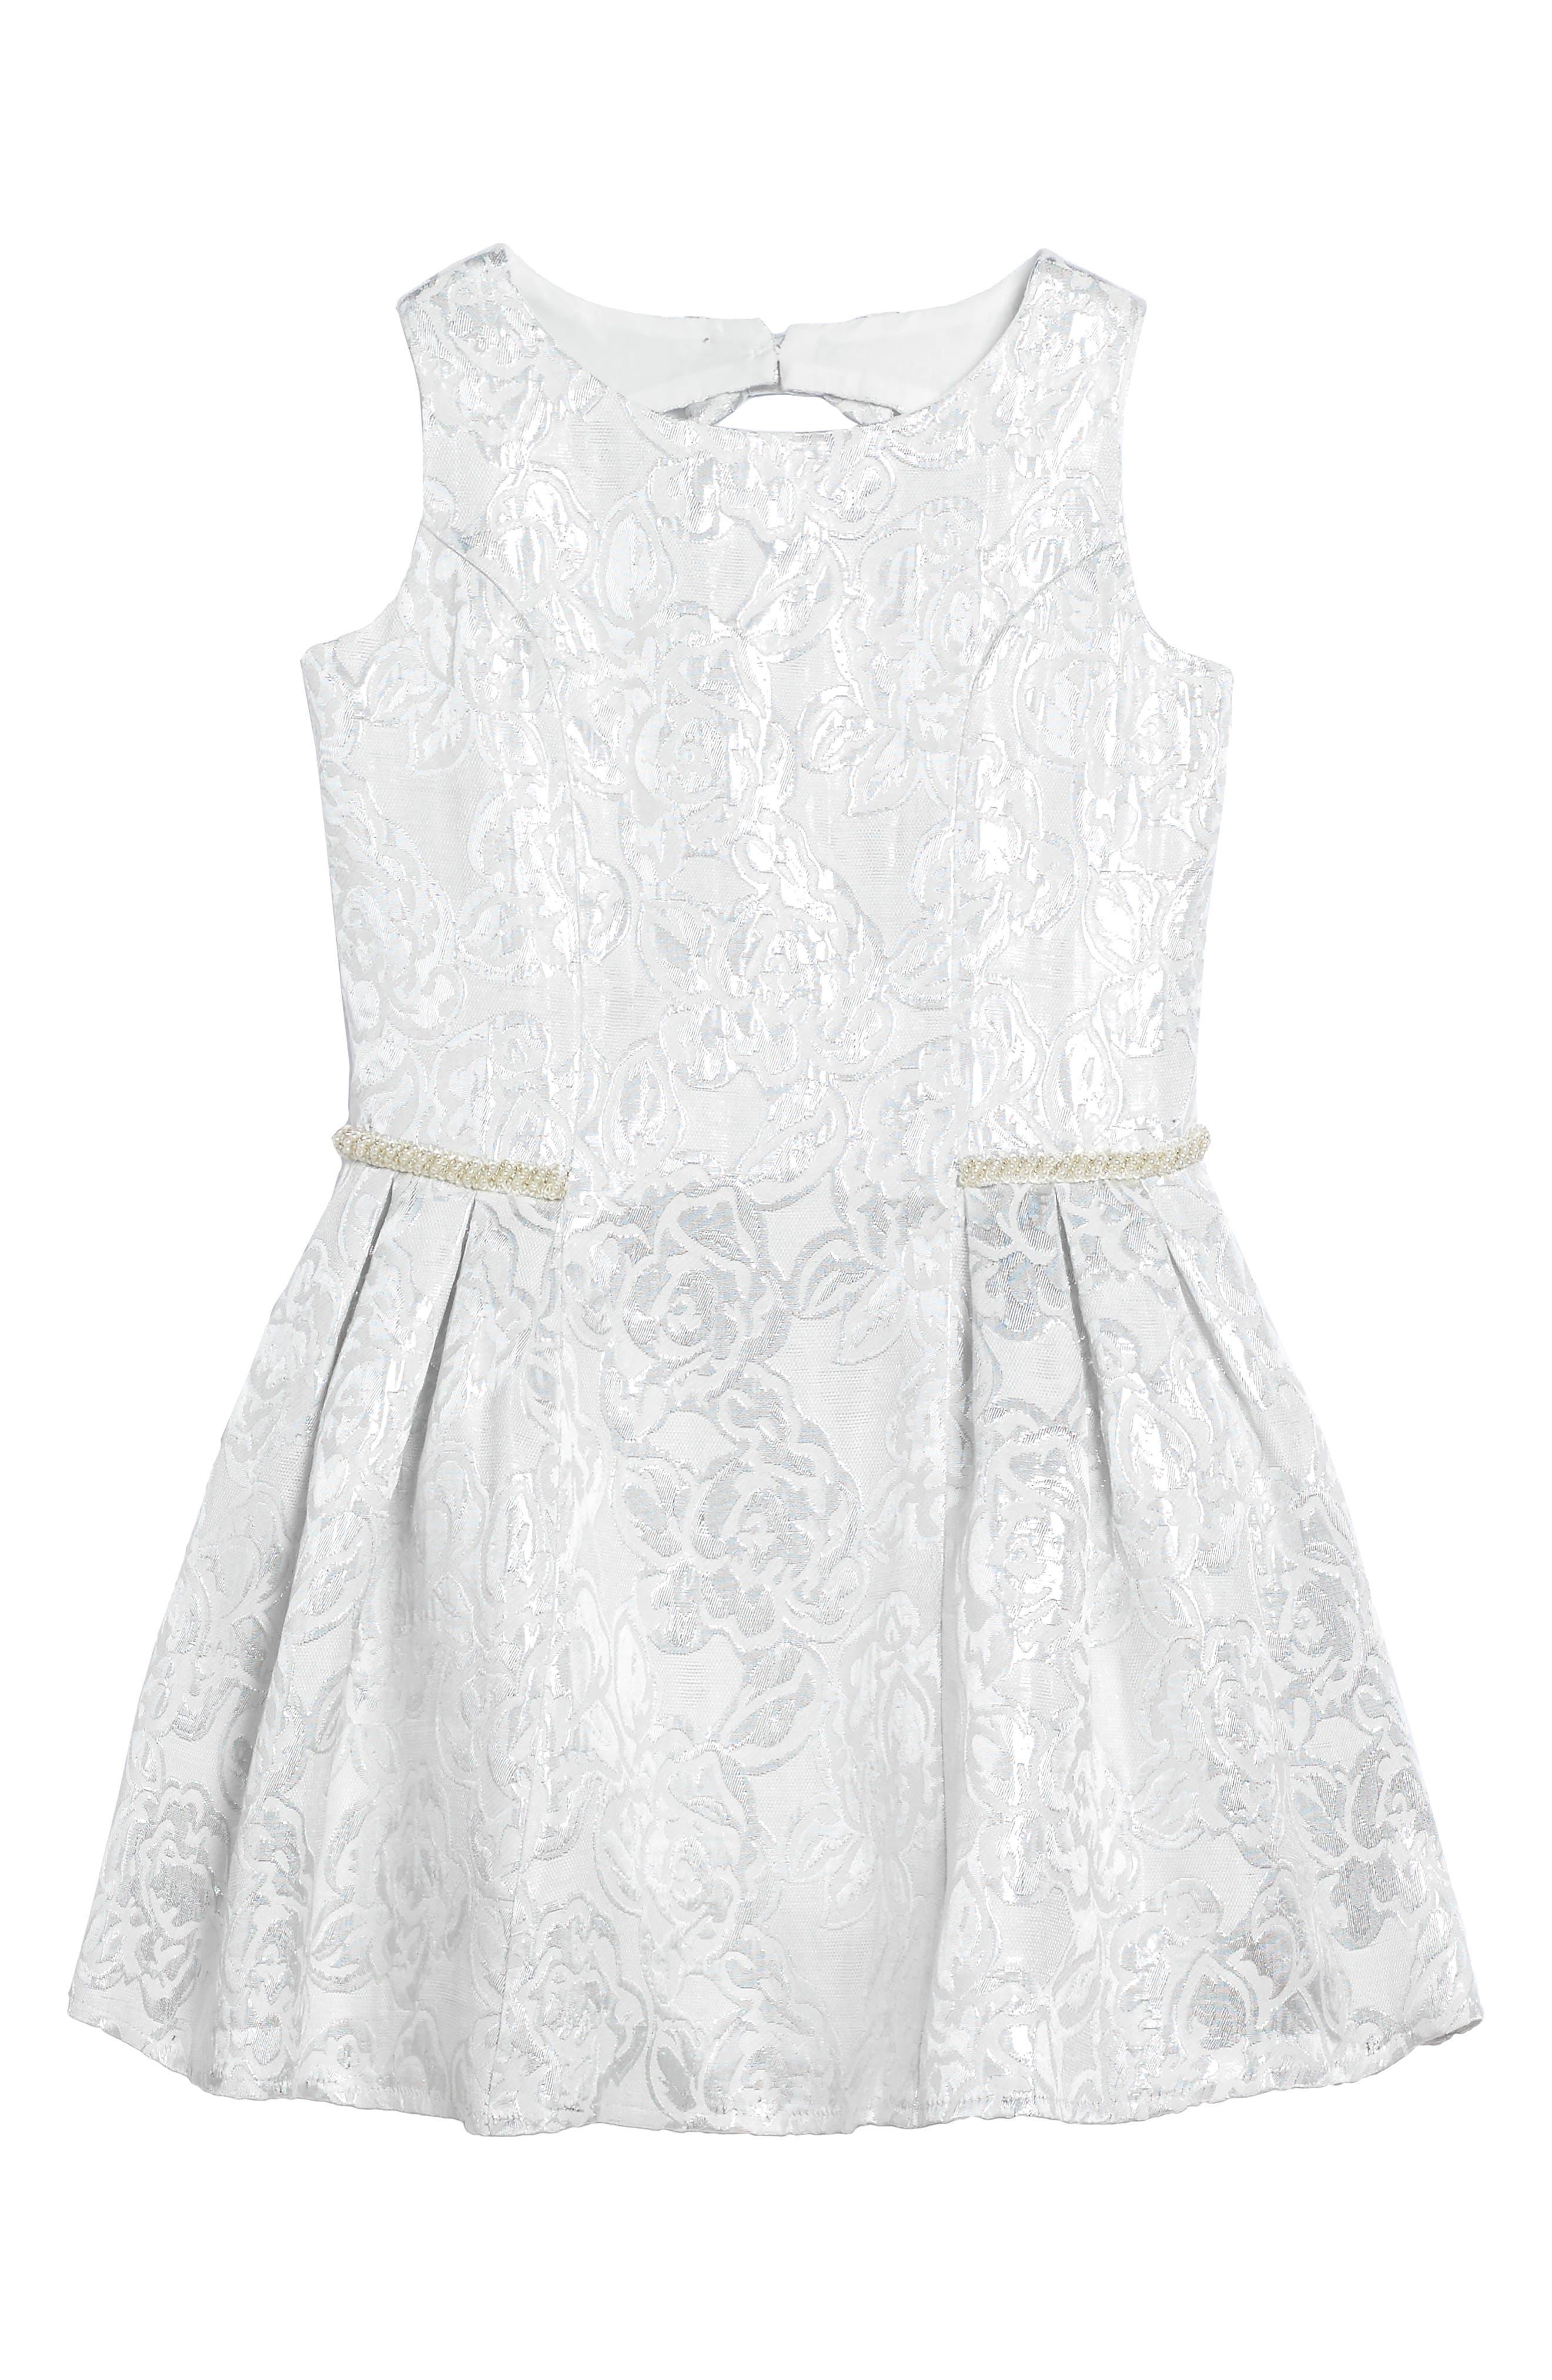 Little Angels Princess Embroidered Dress (Toddler Girls & Little Girls)